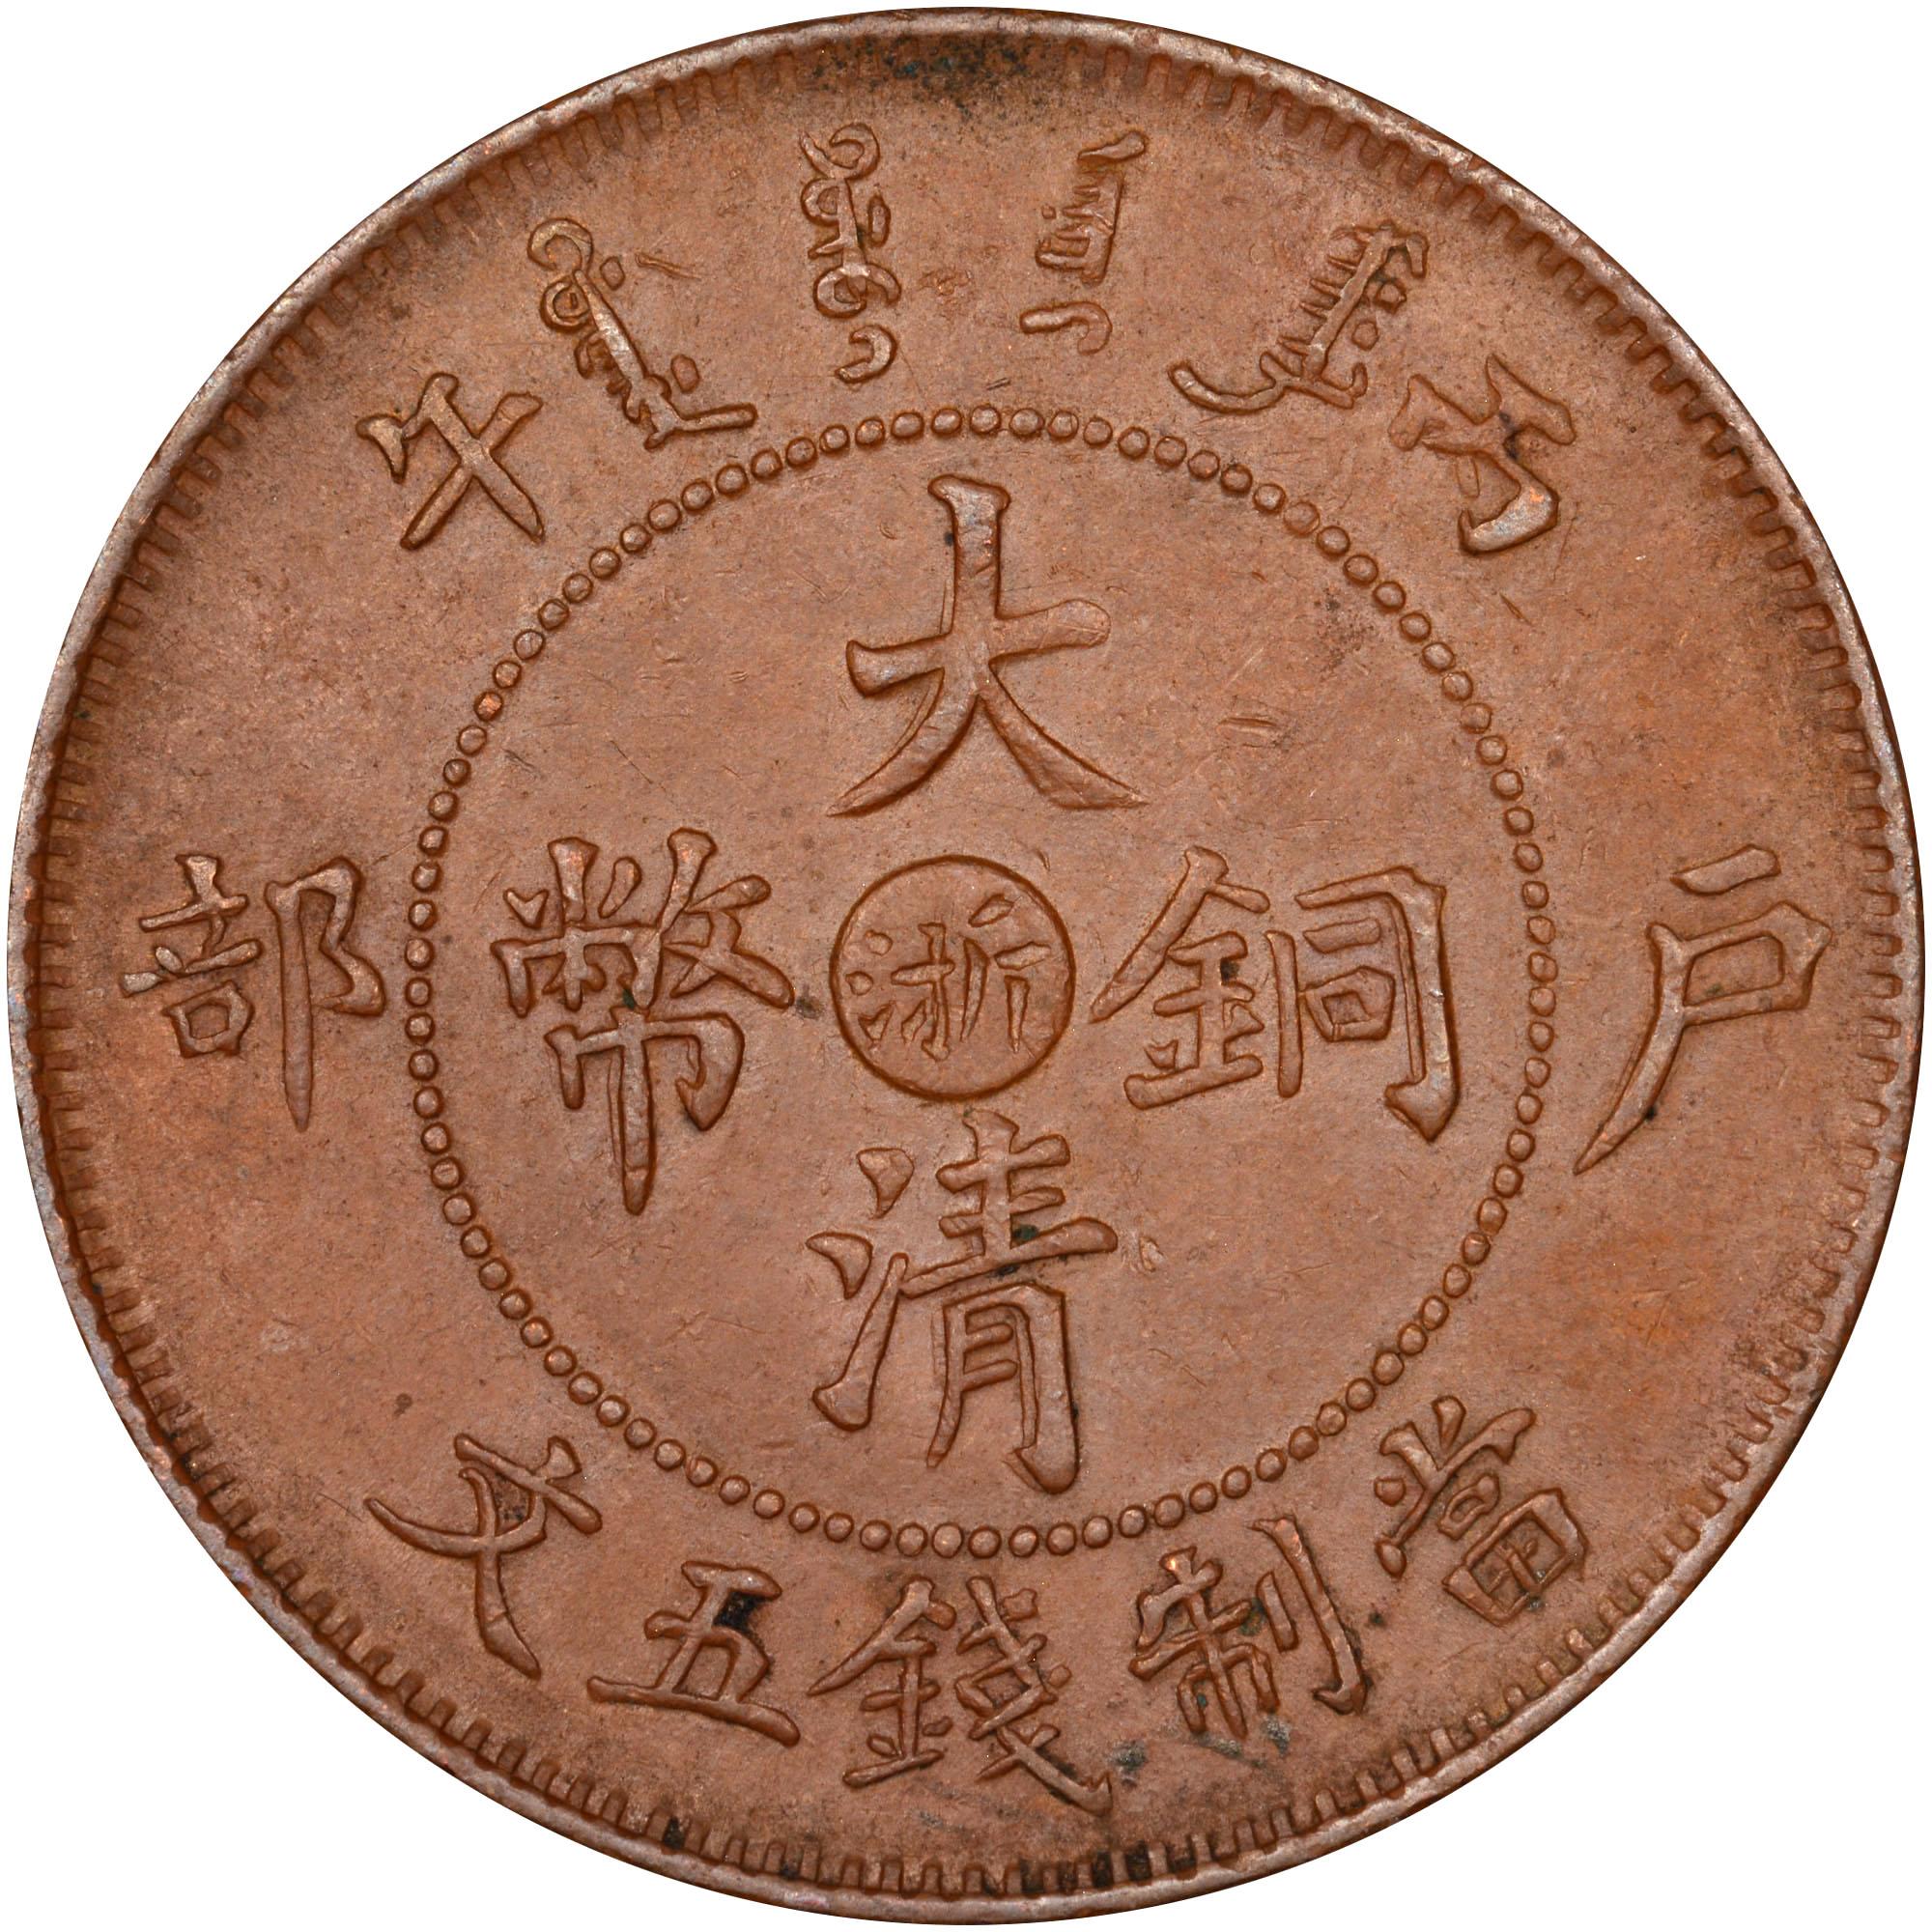 1906 China CHEKIANG PROVINCE 5 Cash obverse